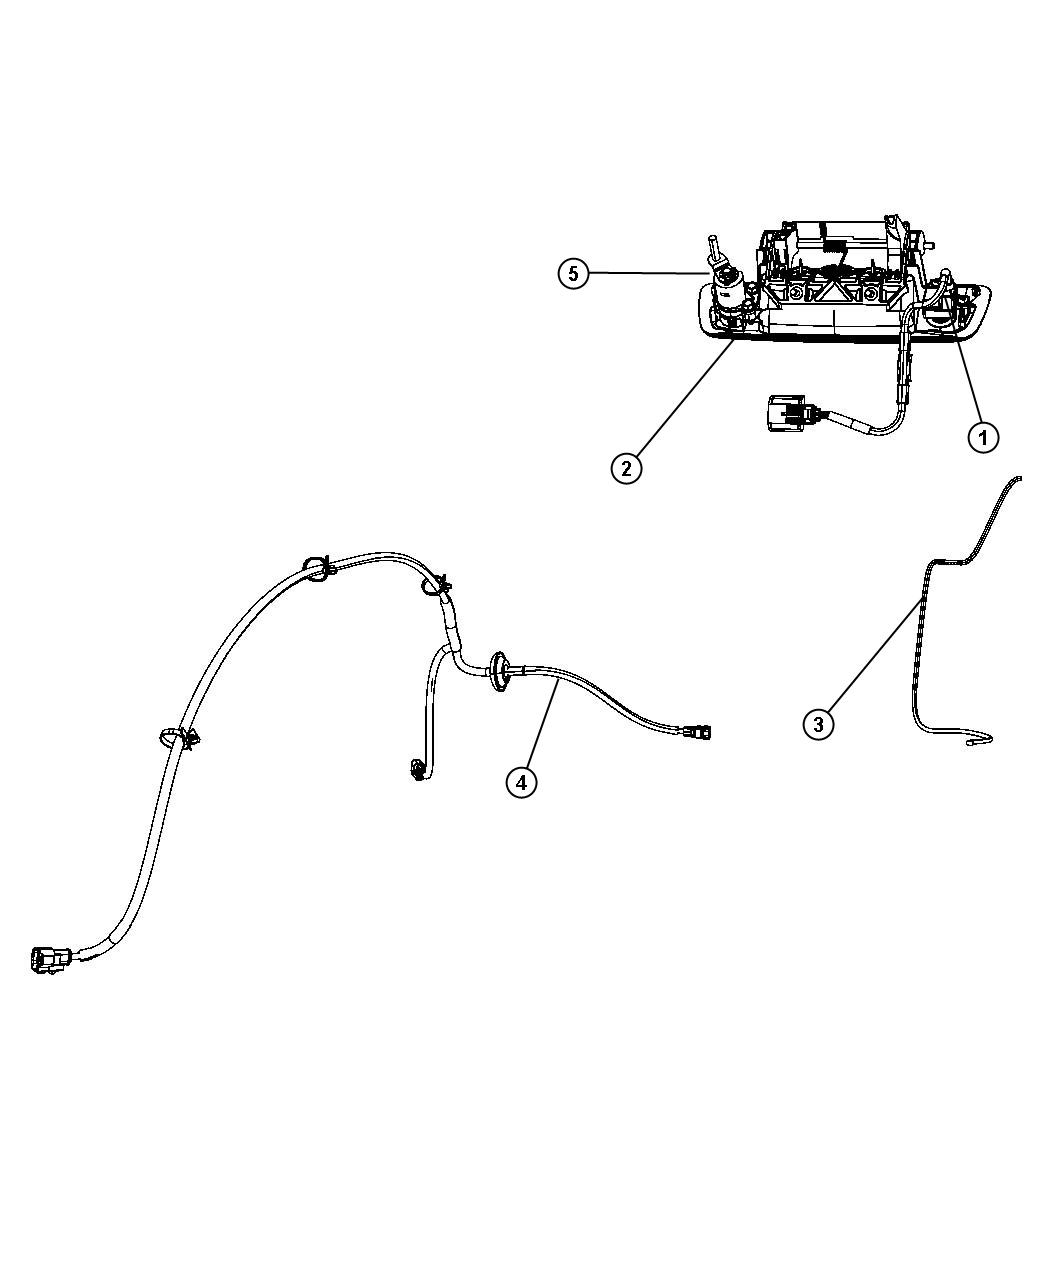 i2244836 Tailgate Camera Wiring Schematic on camera wiring parts, camera motor schematic, camera lens schematic,